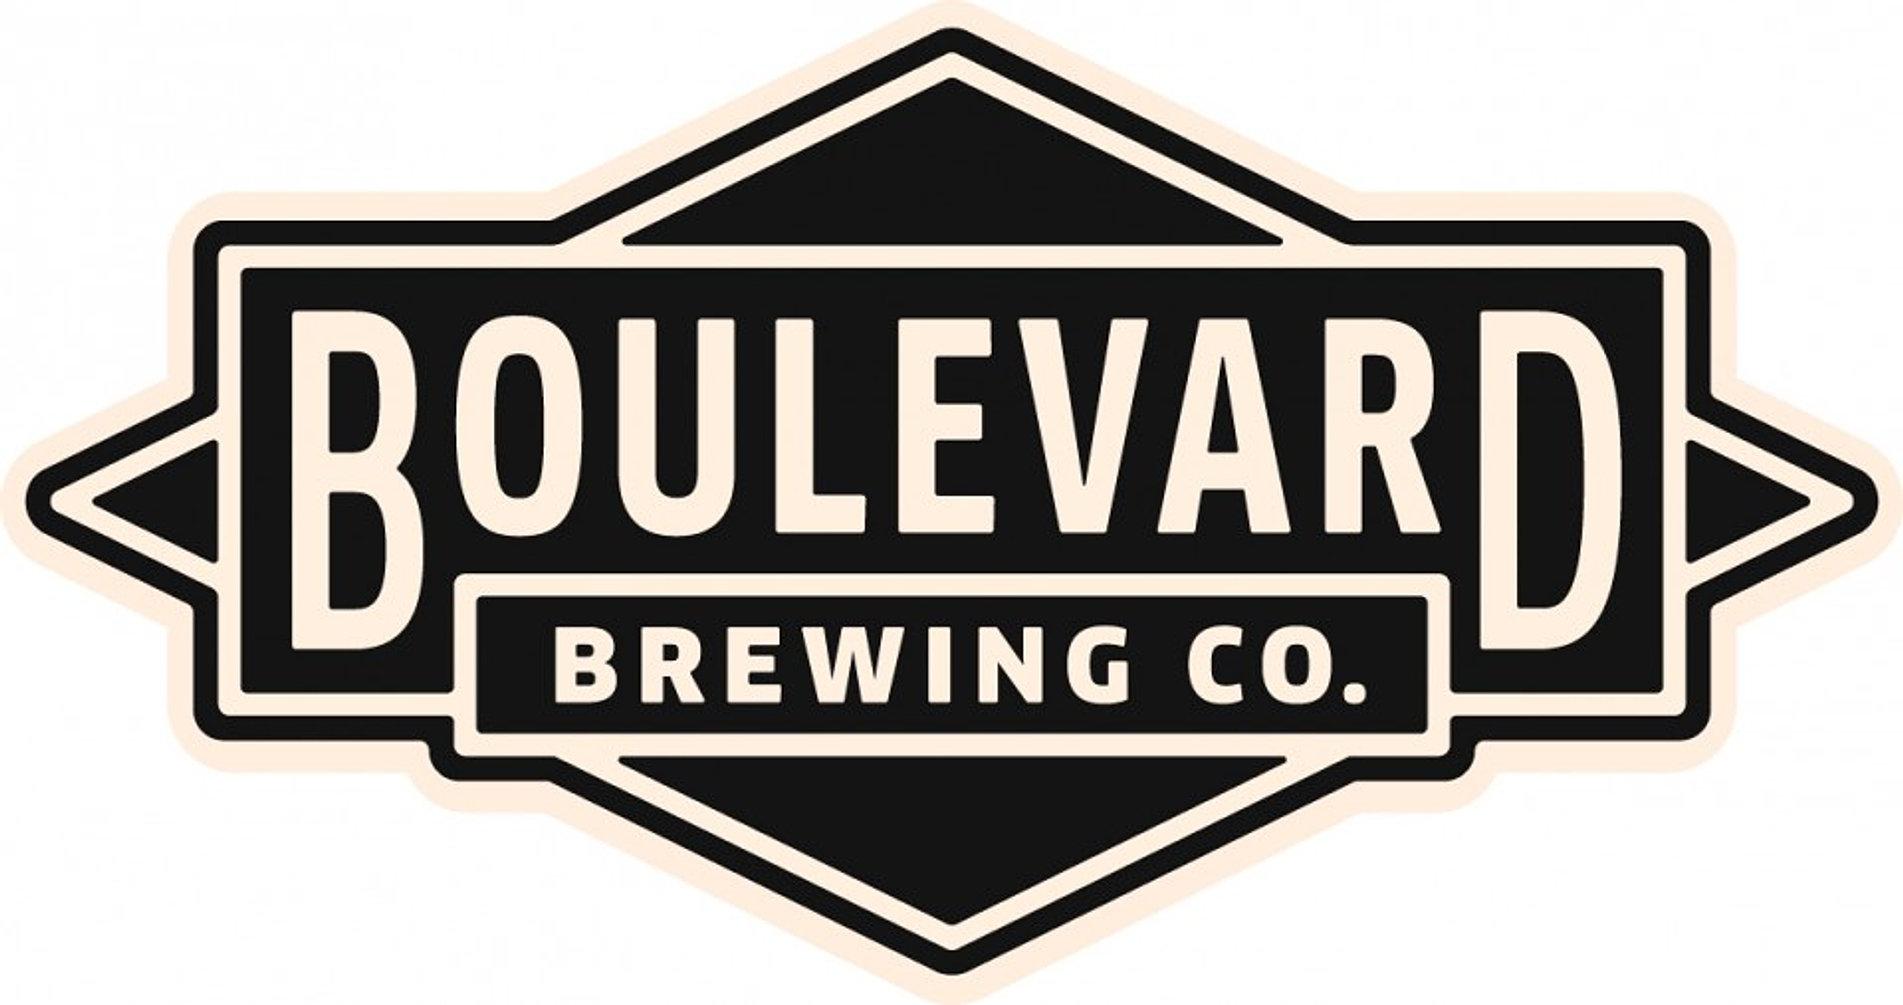 Boulevard Brewing Logo 2015 960x507